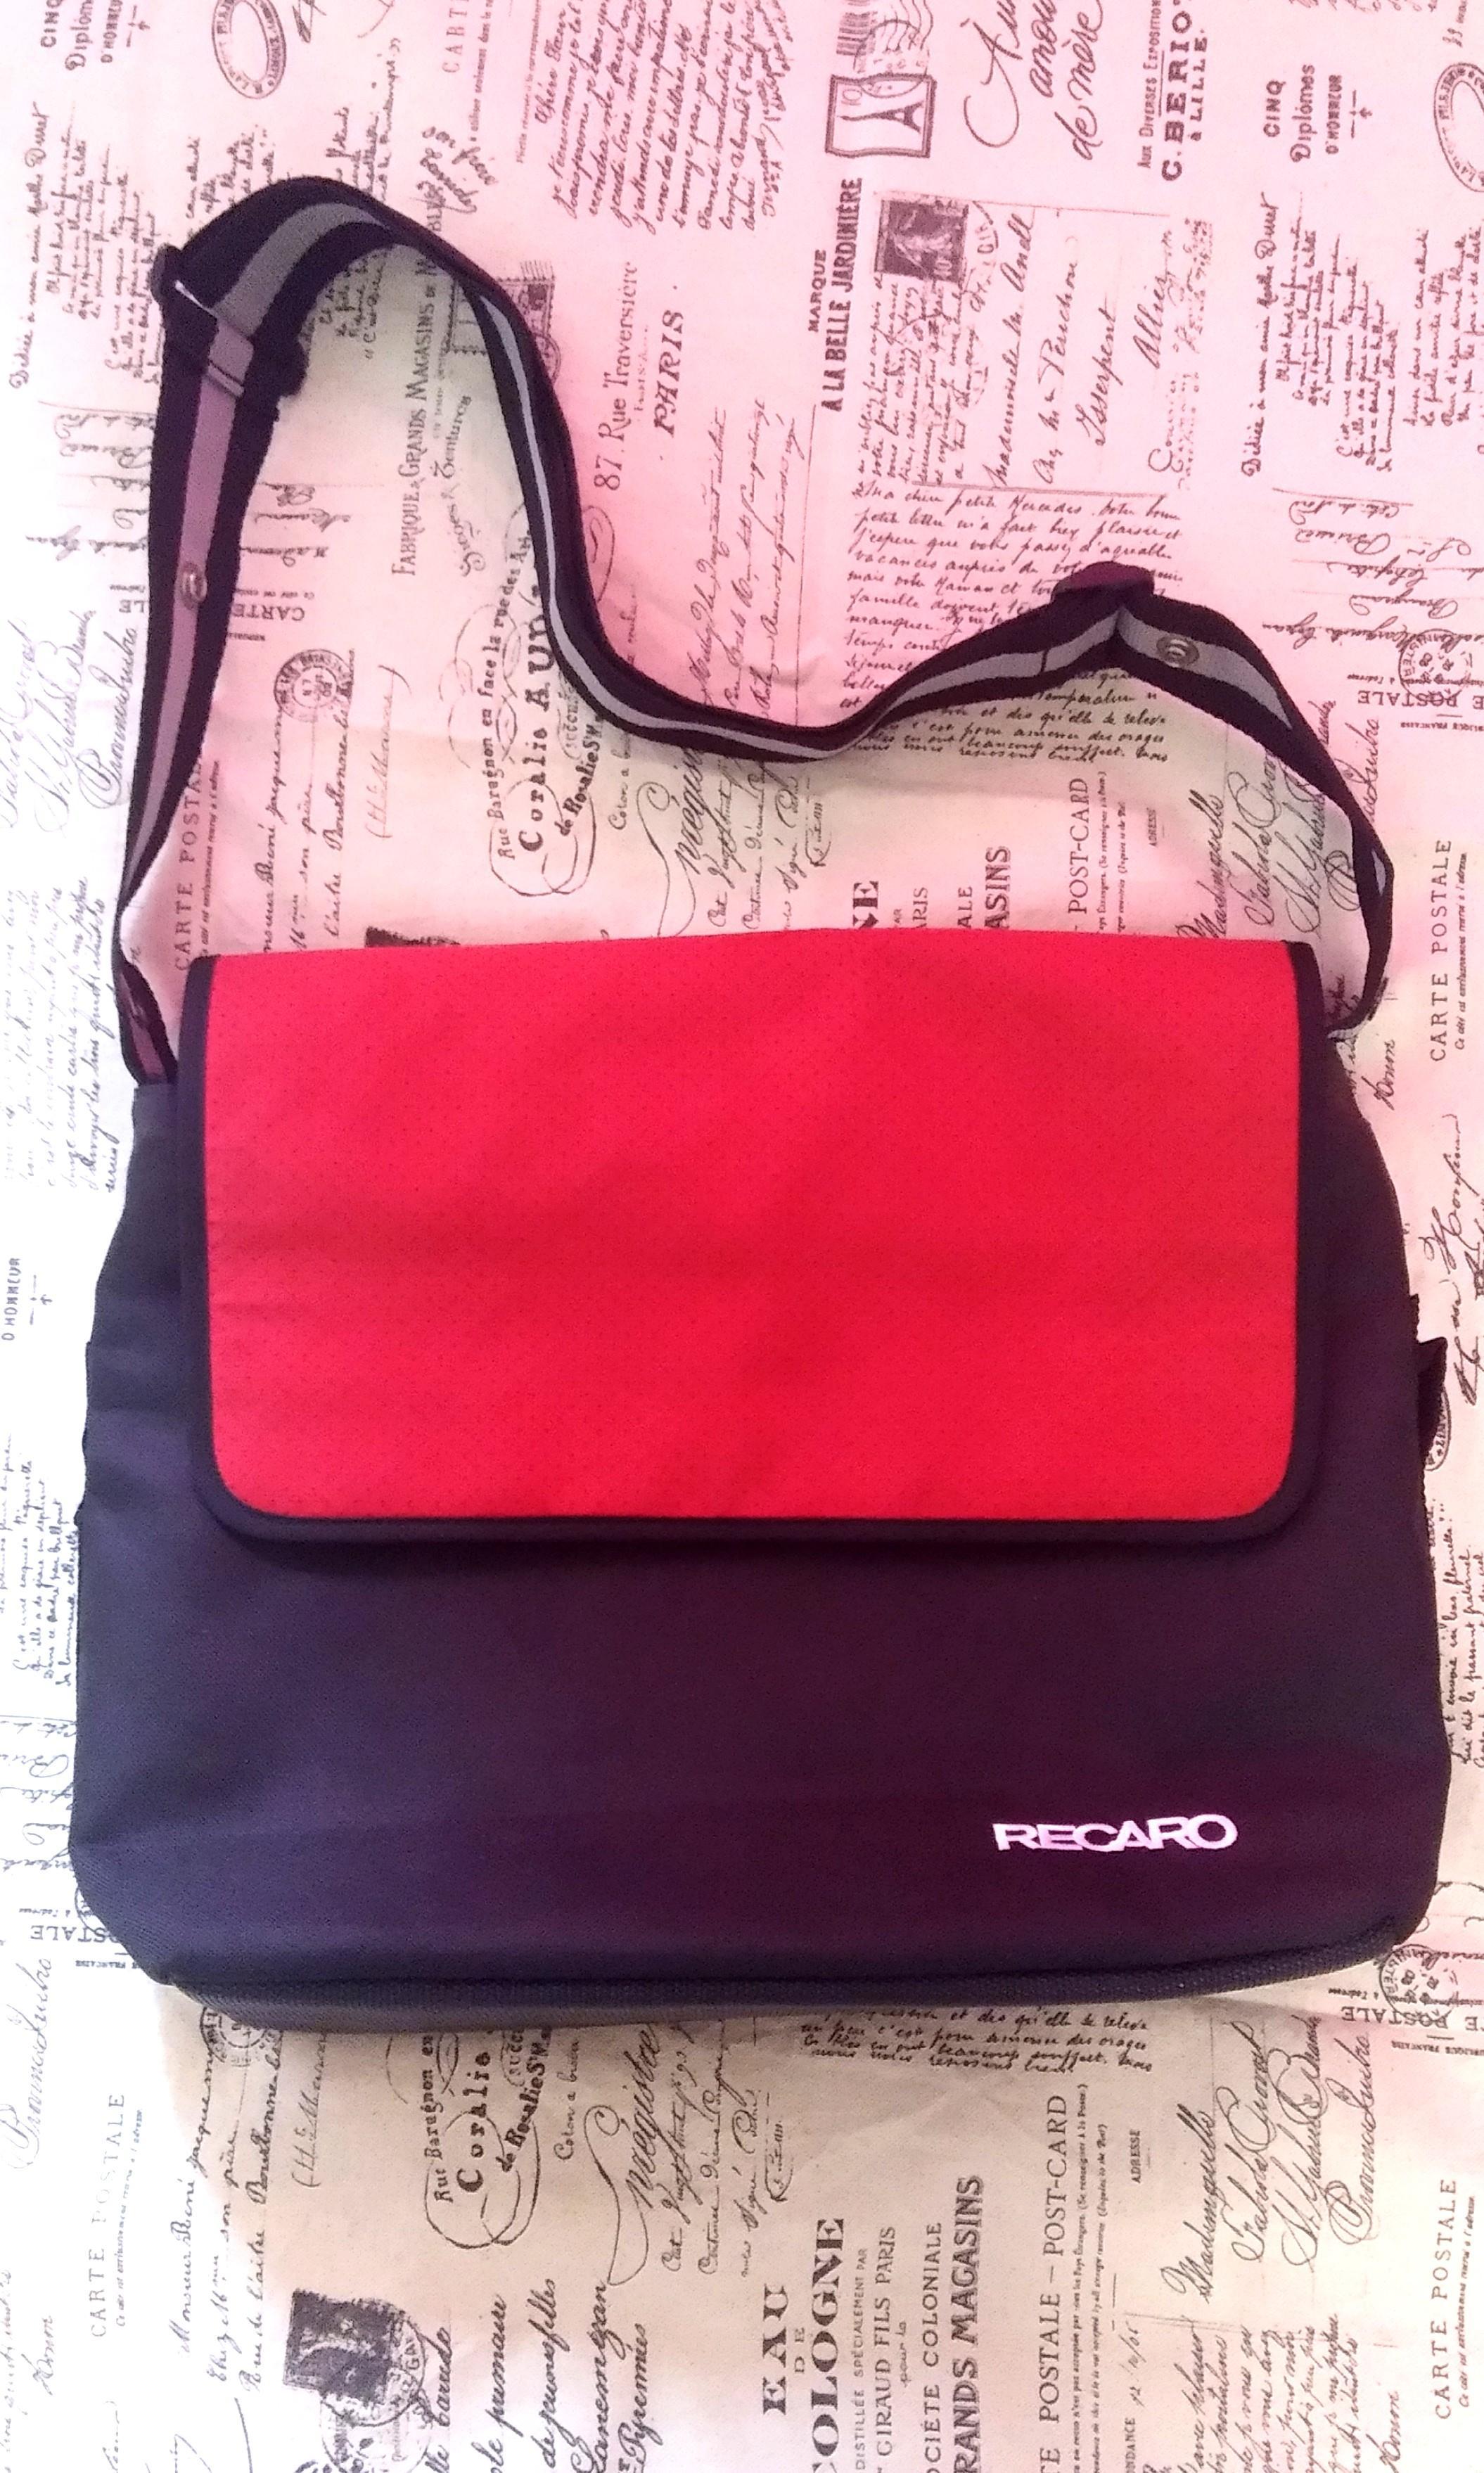 100% AUTHENTIC RECARO SLING BAG